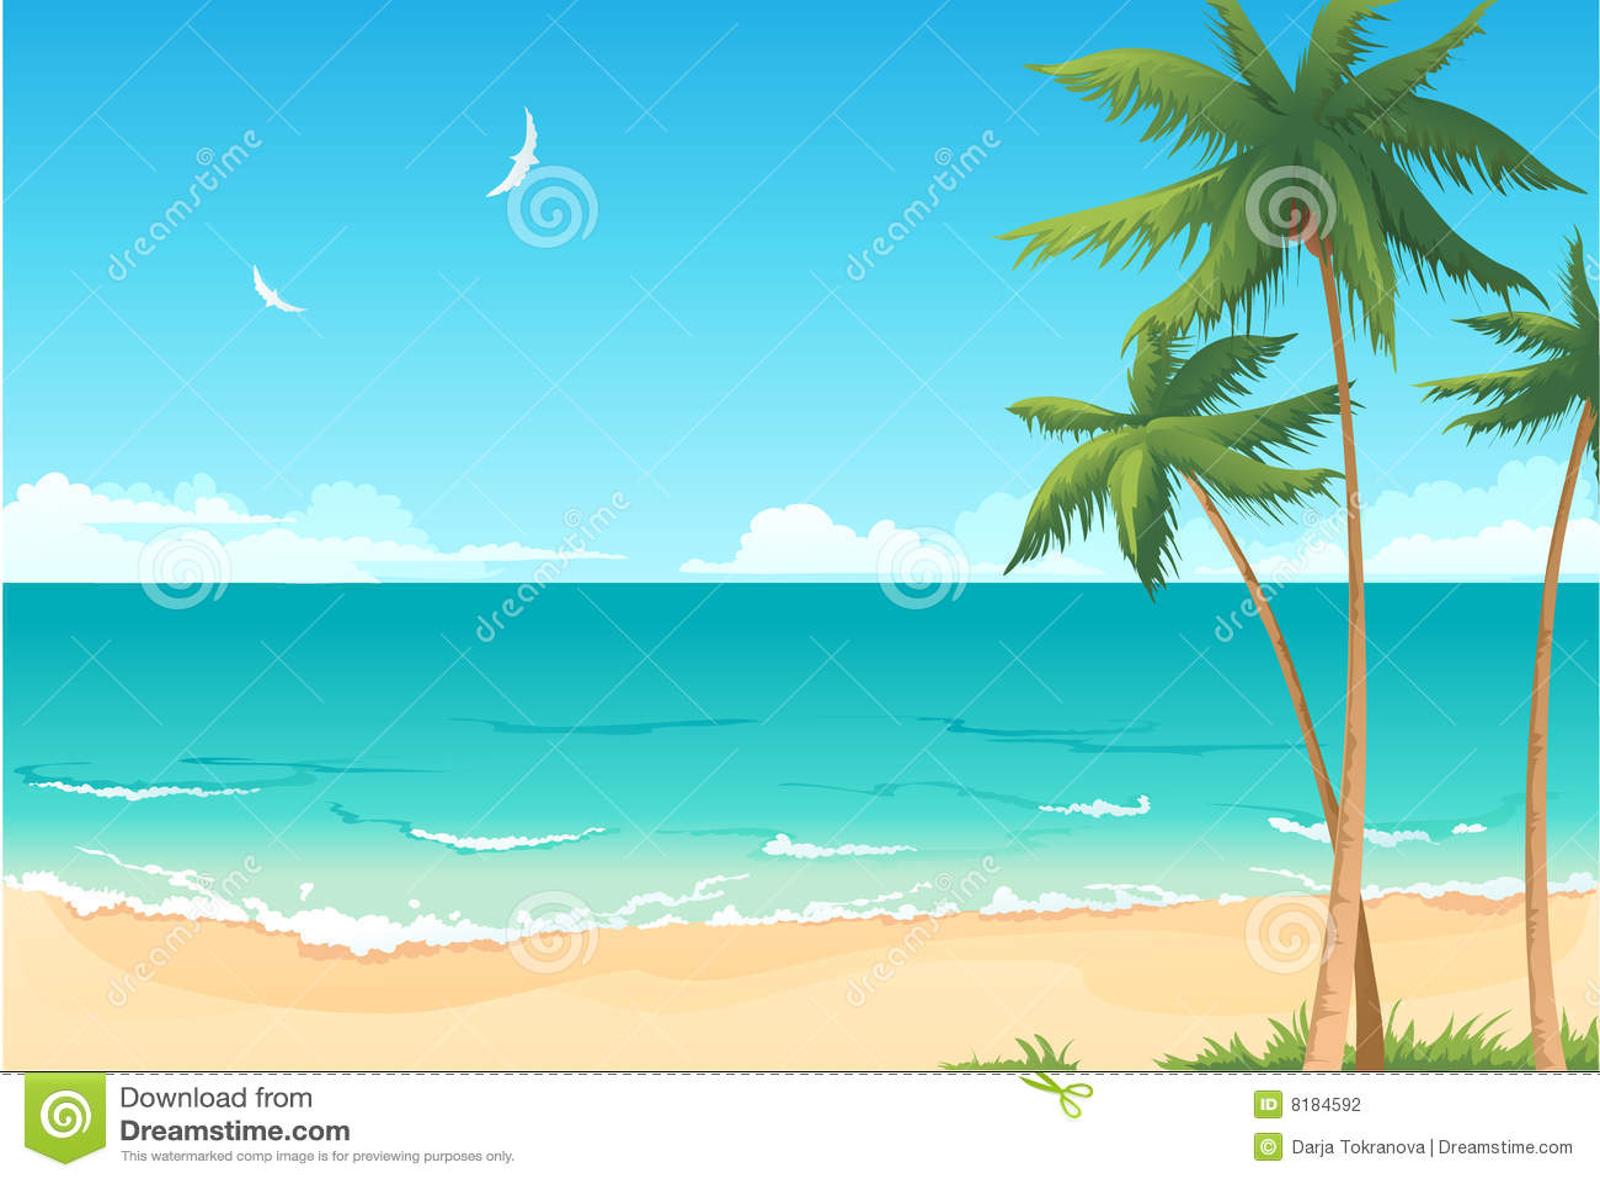 Go Back > Pix For > Summer Beach Photography: pixgood.com/summer-beach-photography.html